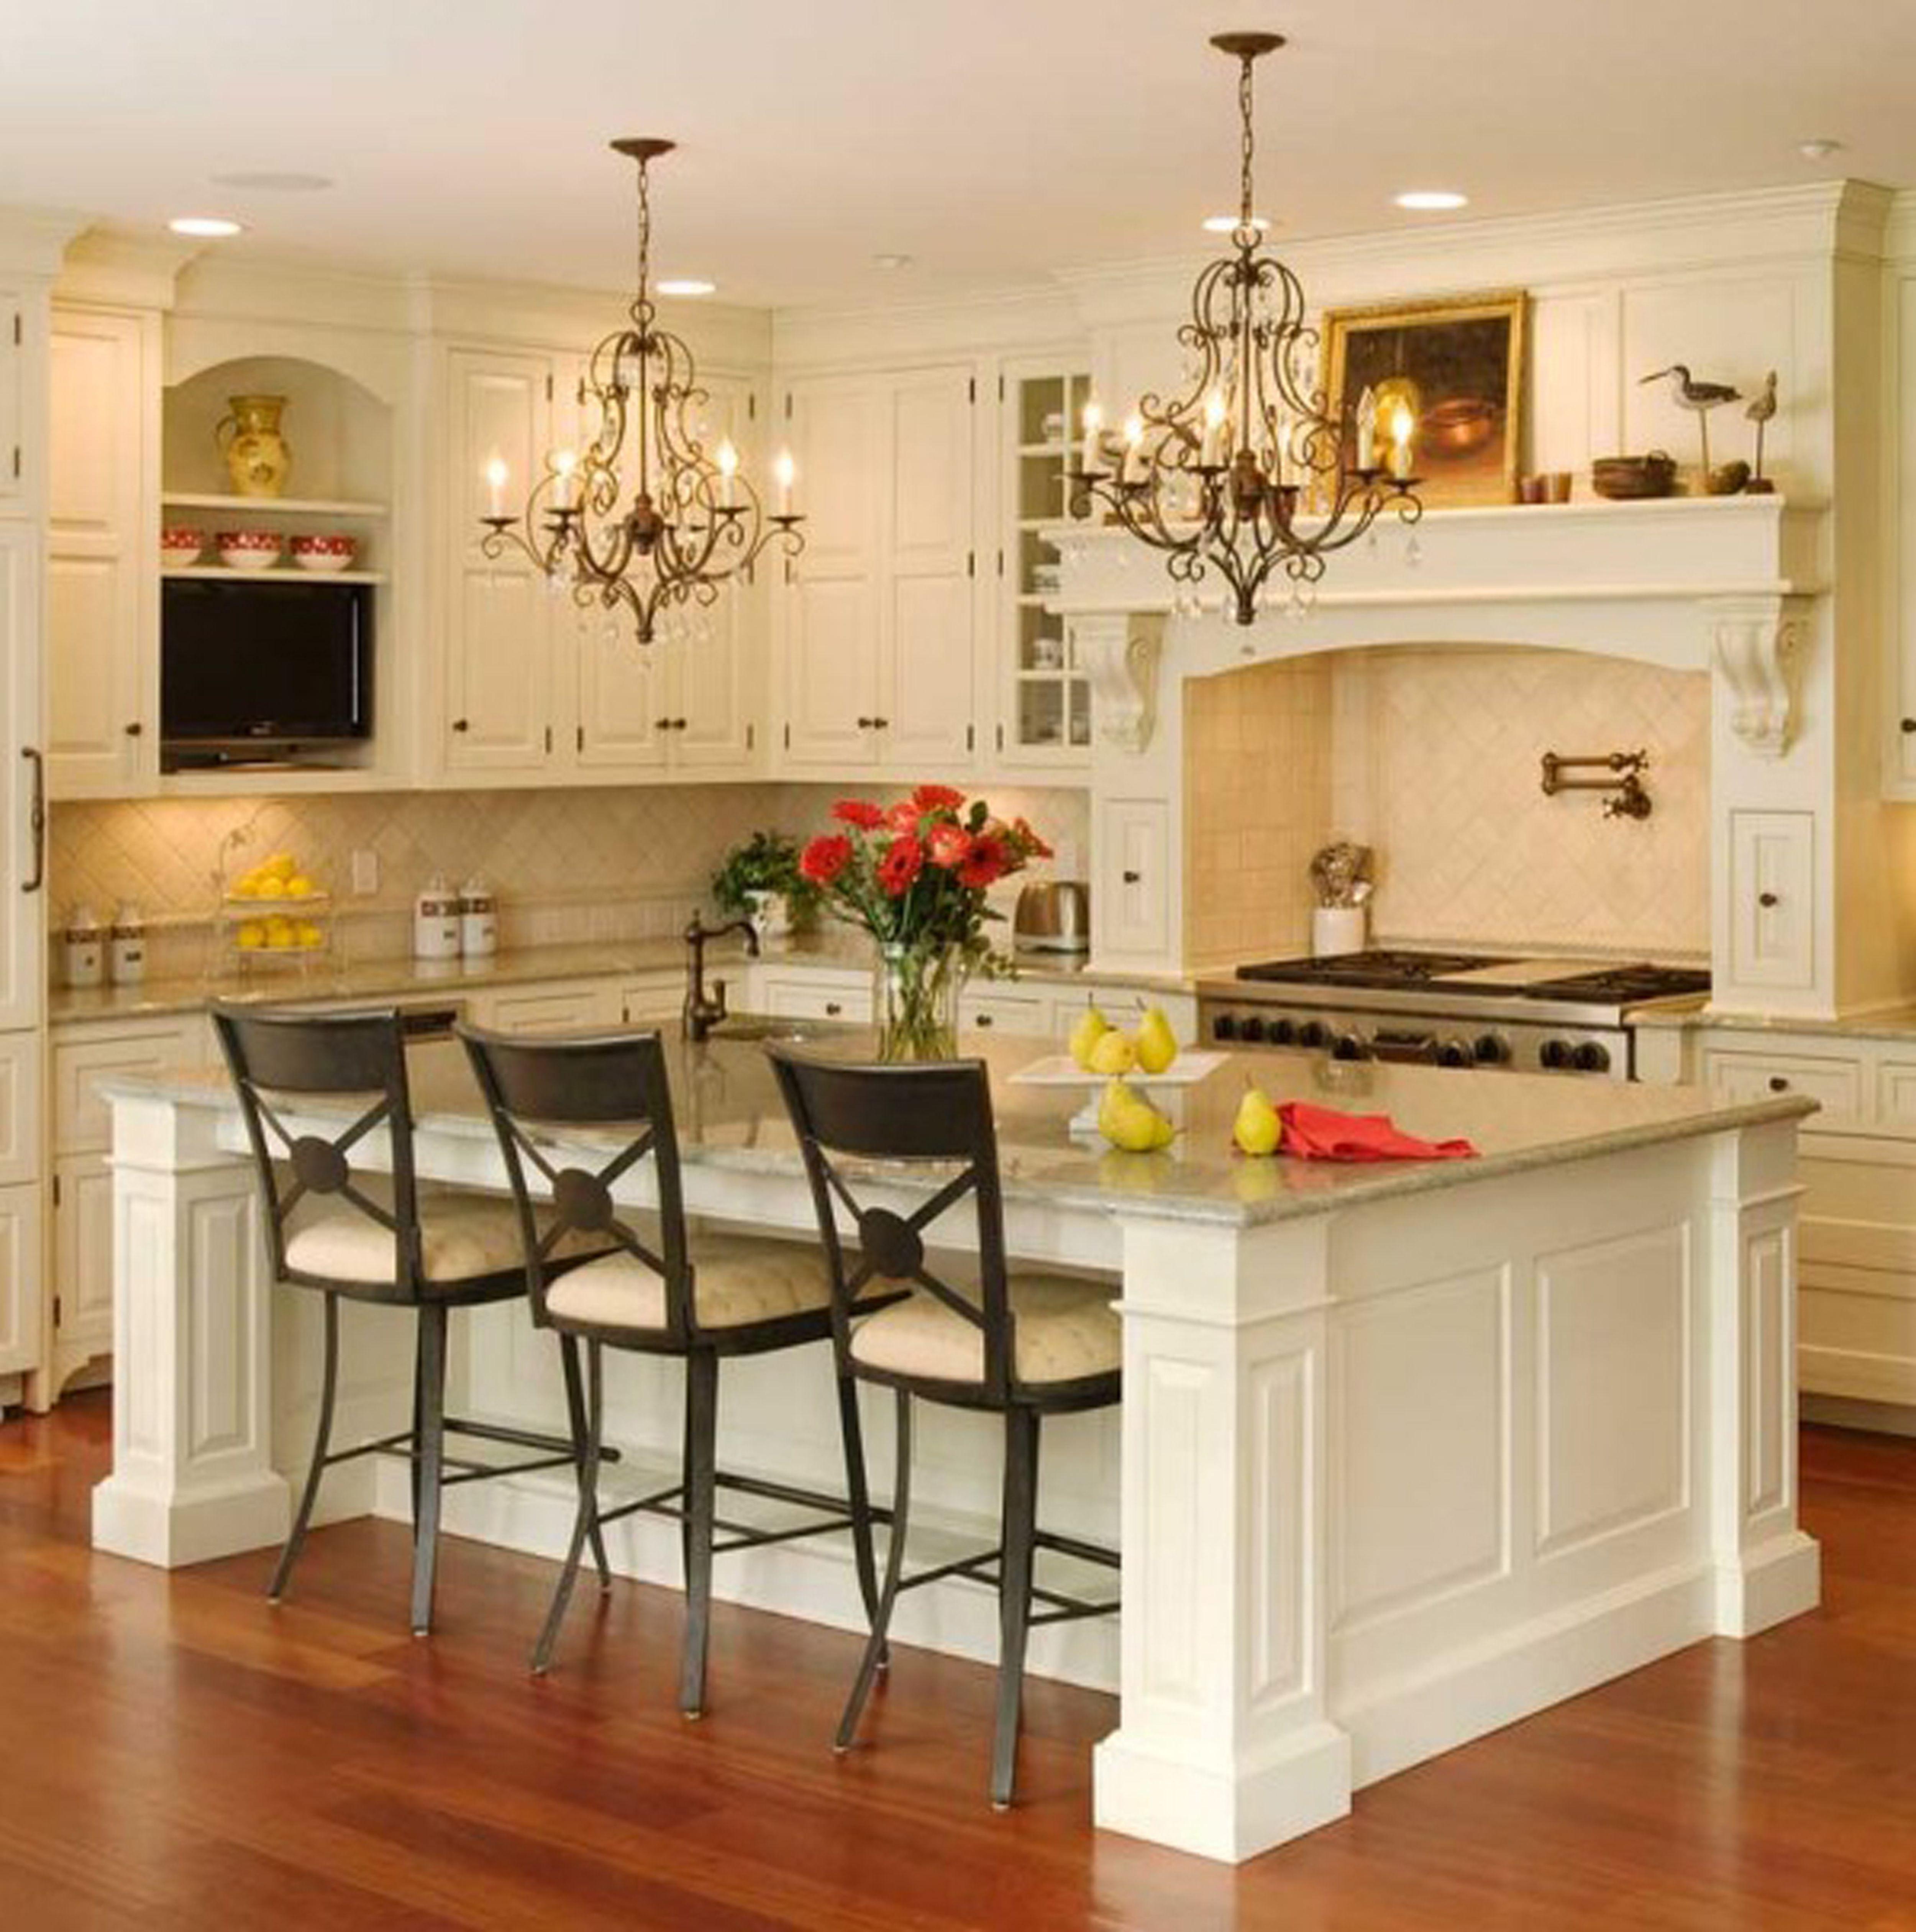 Kitchen Decorating Idea 3